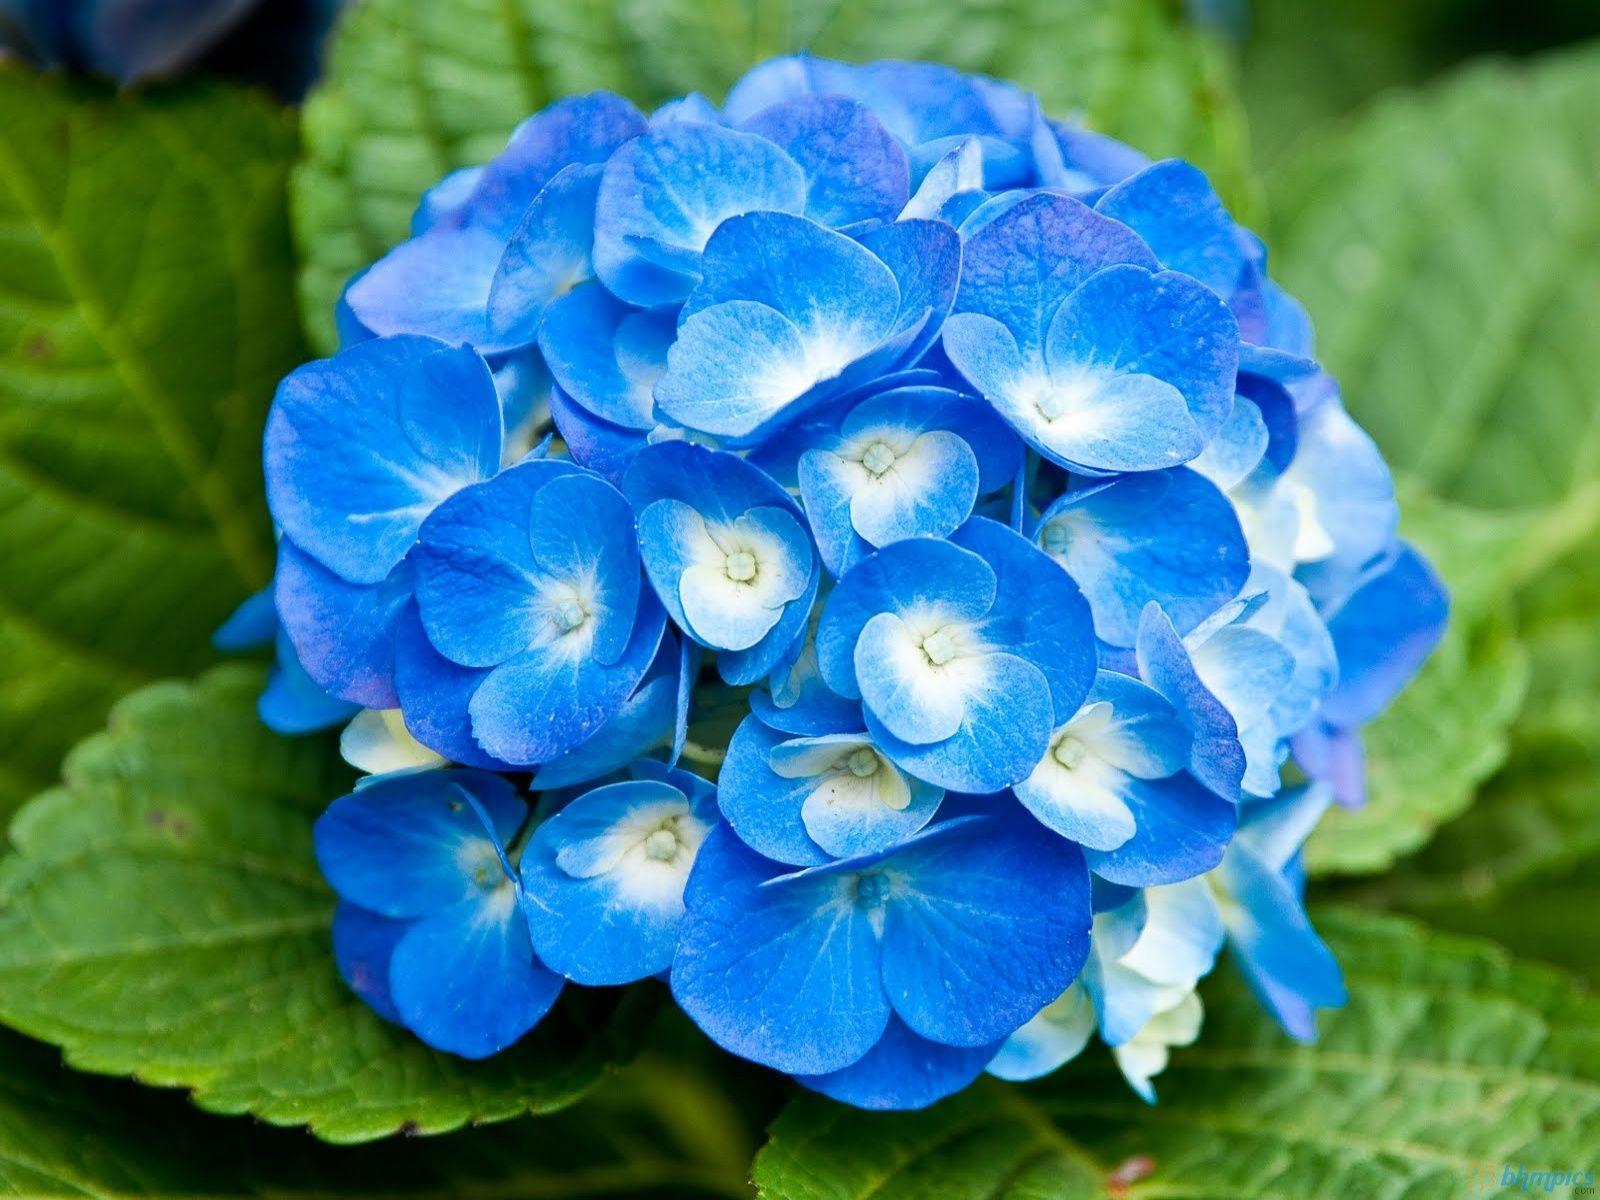 40 best free royal blue flowers hd wallpapers wallpaperaccess 1920x1080 best of royal blue flower wallpaper hd wallpaper vixel izmirmasajfo